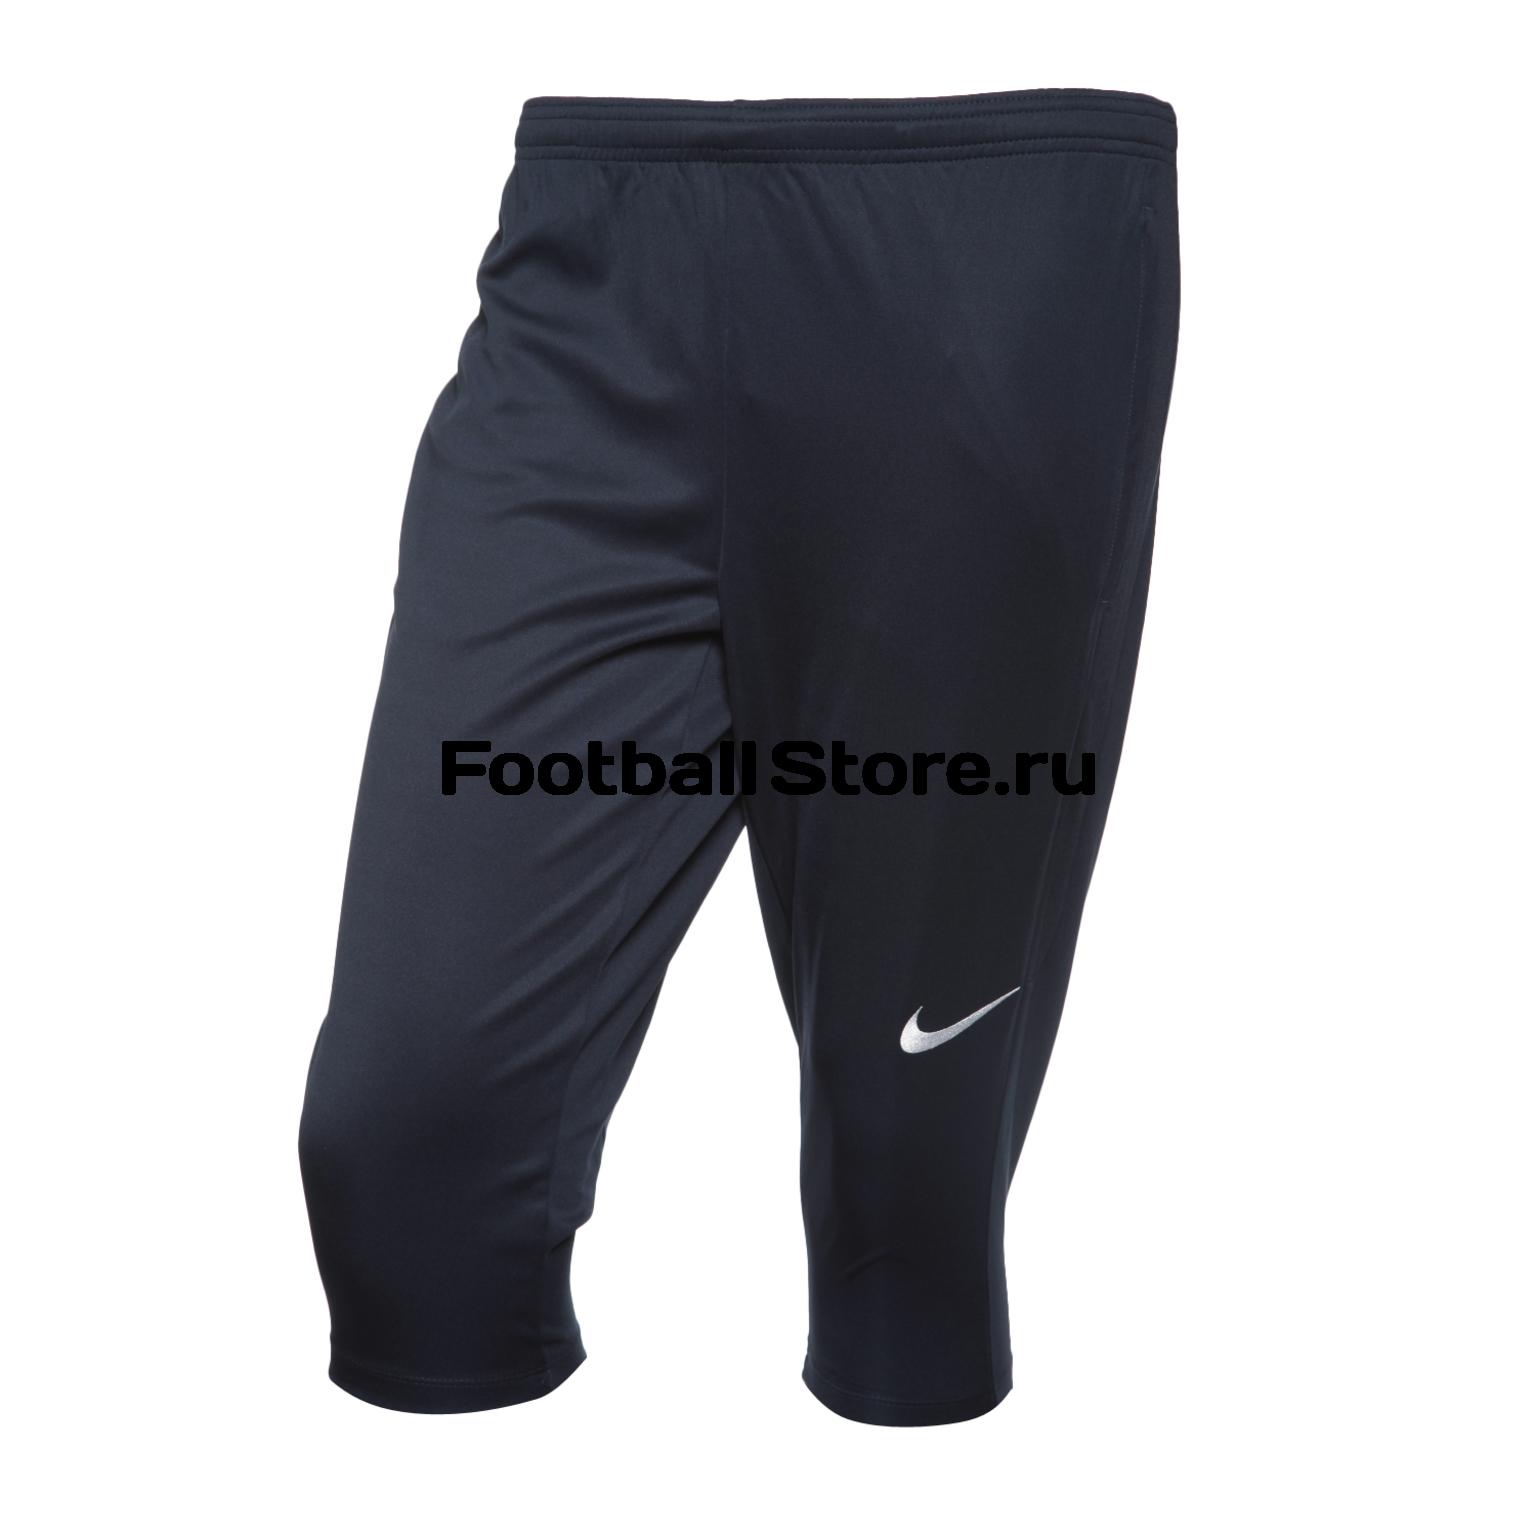 Брюки тренировочные 3/4 Nike Dry Academy18 3QT Pant KPZ 893793-451 original new arrival 2018 nike dry acdmy pant kpz men s pants sportswear